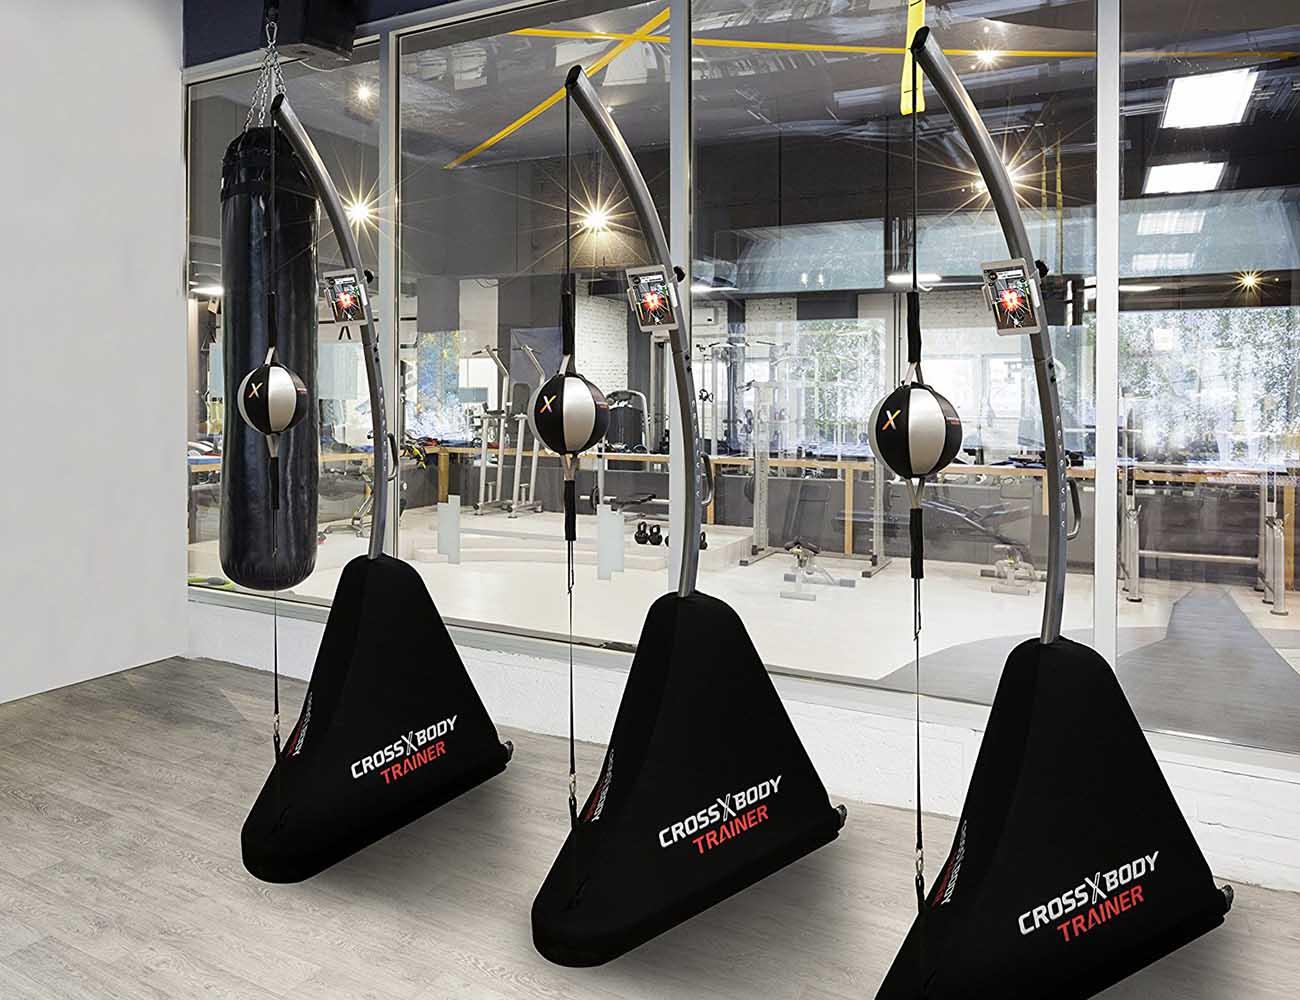 Cross+Body+Trainer+System